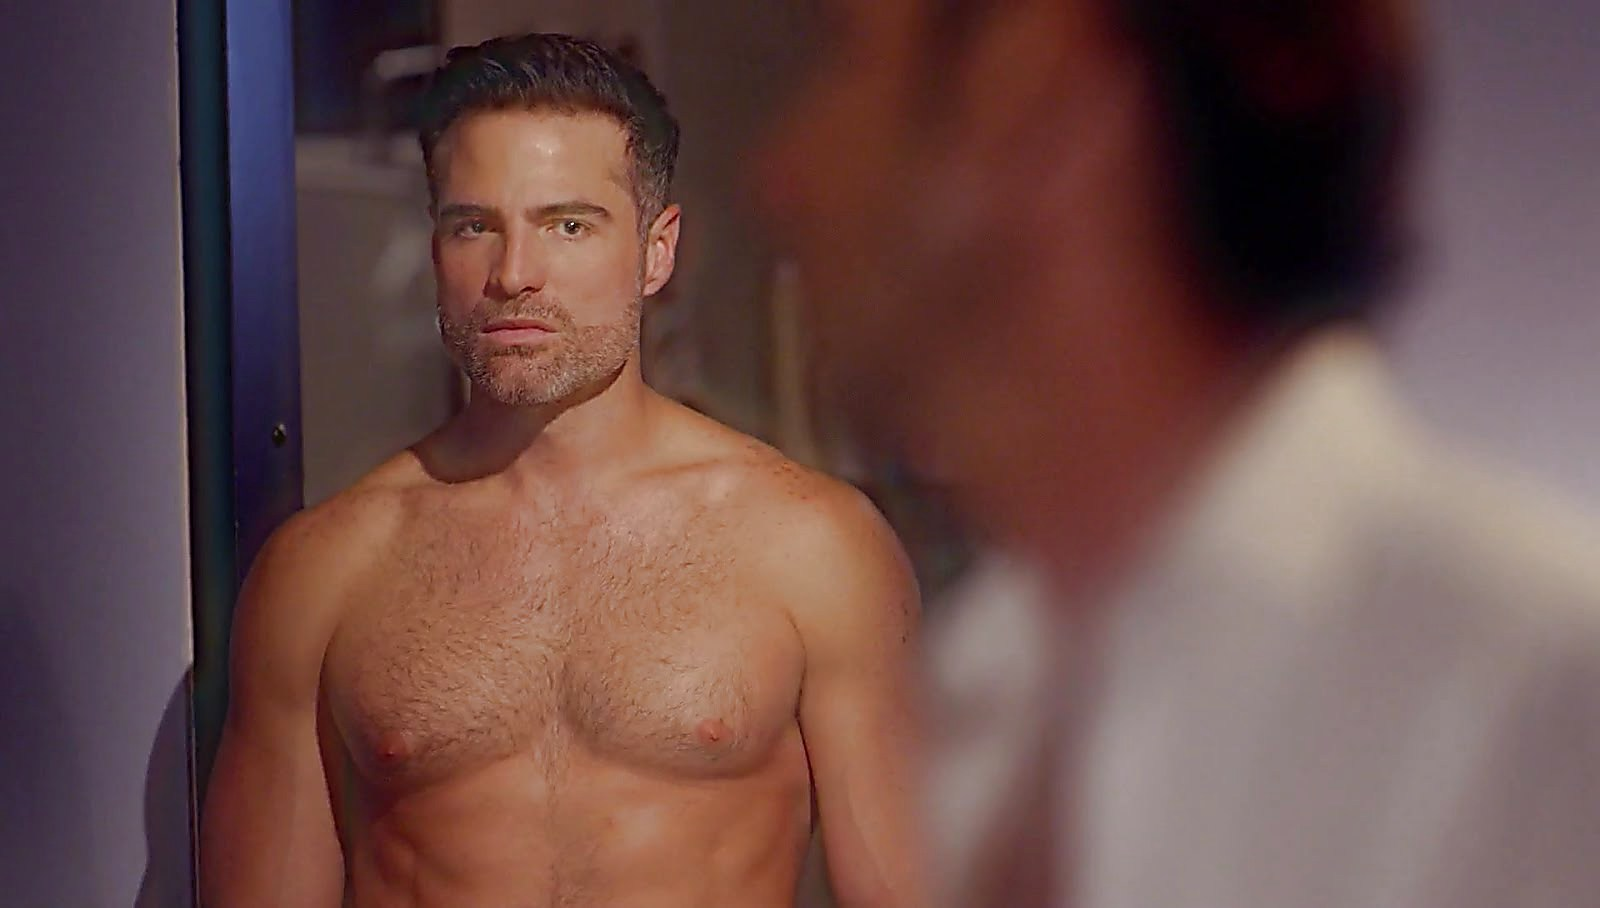 Roberto Manrique sexy shirtless scene November 19, 2017, 1pm